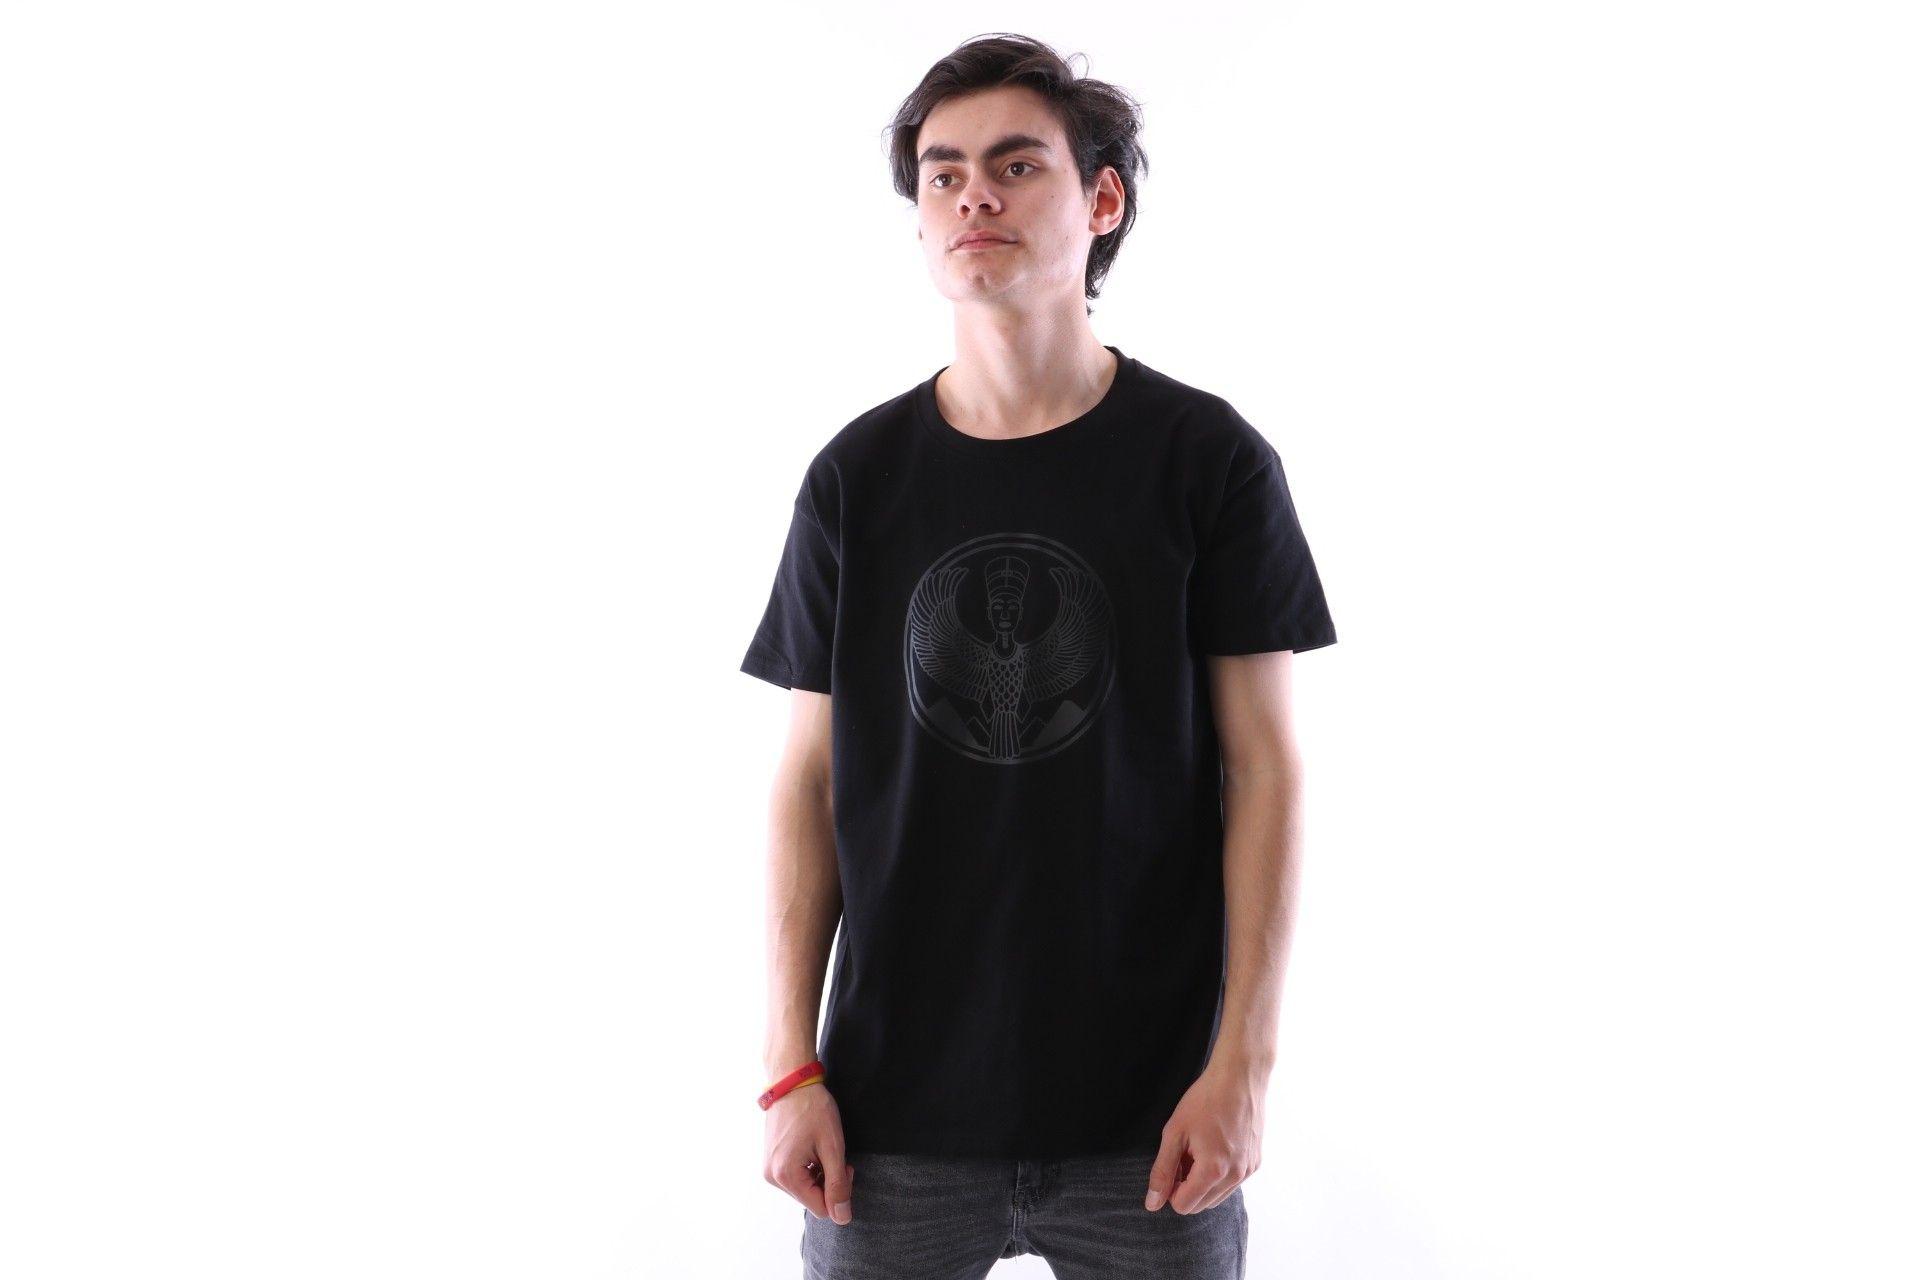 Afbeelding van Pharaoh Official T-Shirt Black On Black Zwart